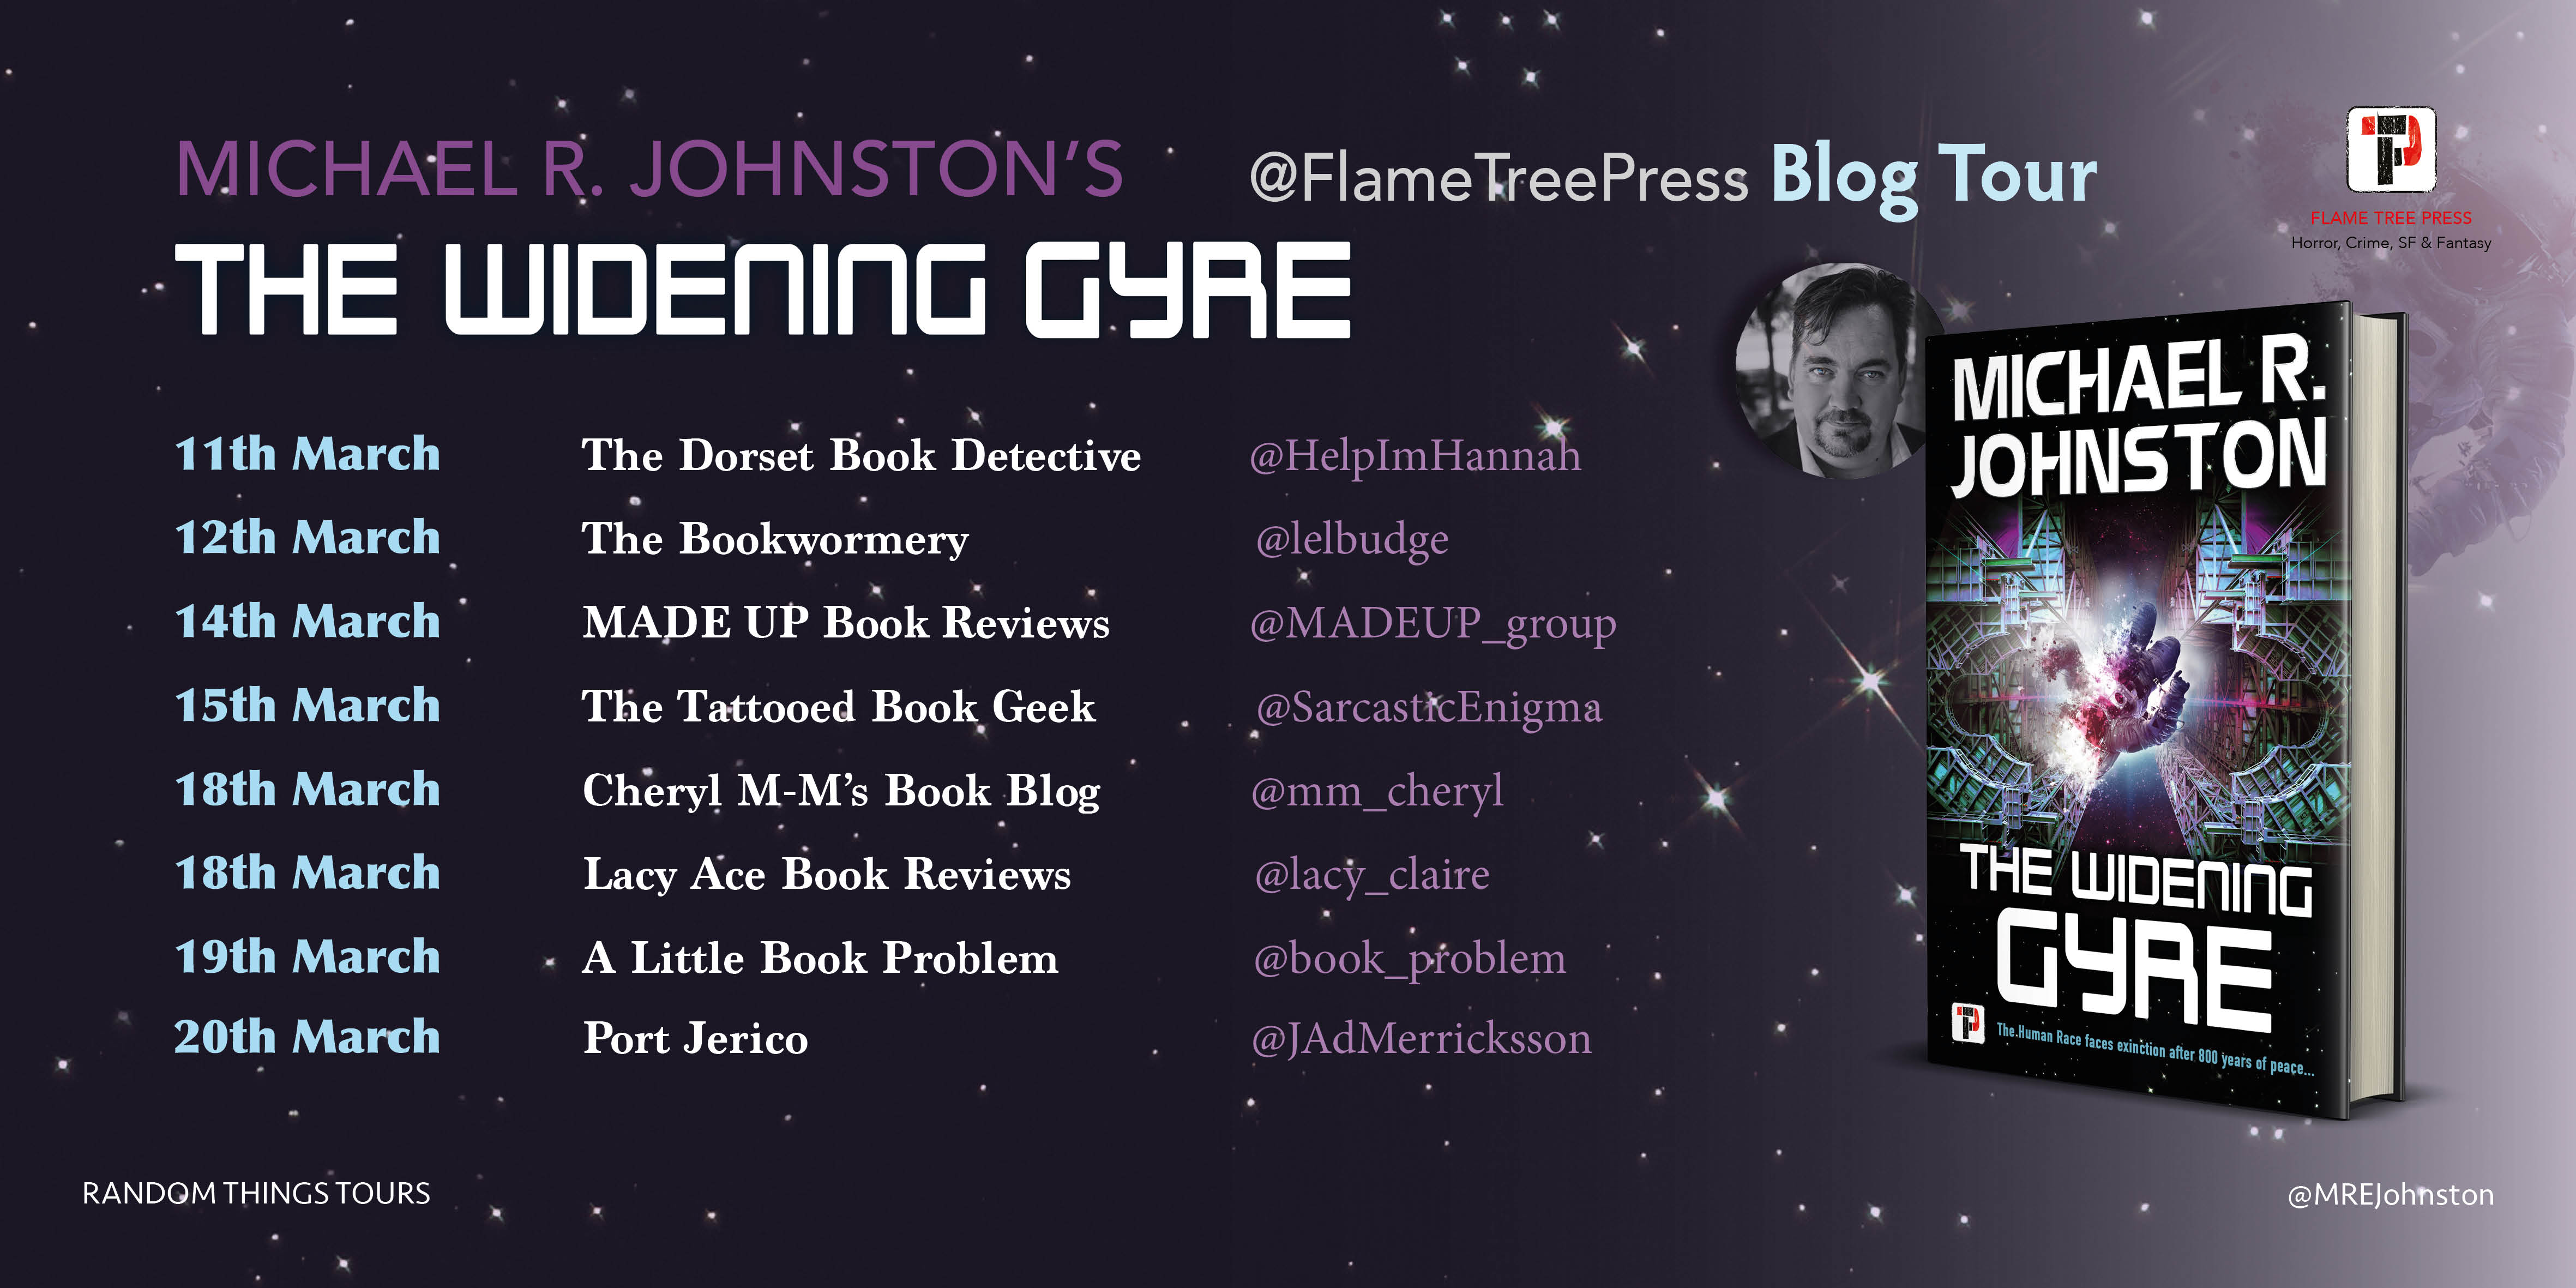 Michael R. Johnston - The Widening Gyre Blog Tour